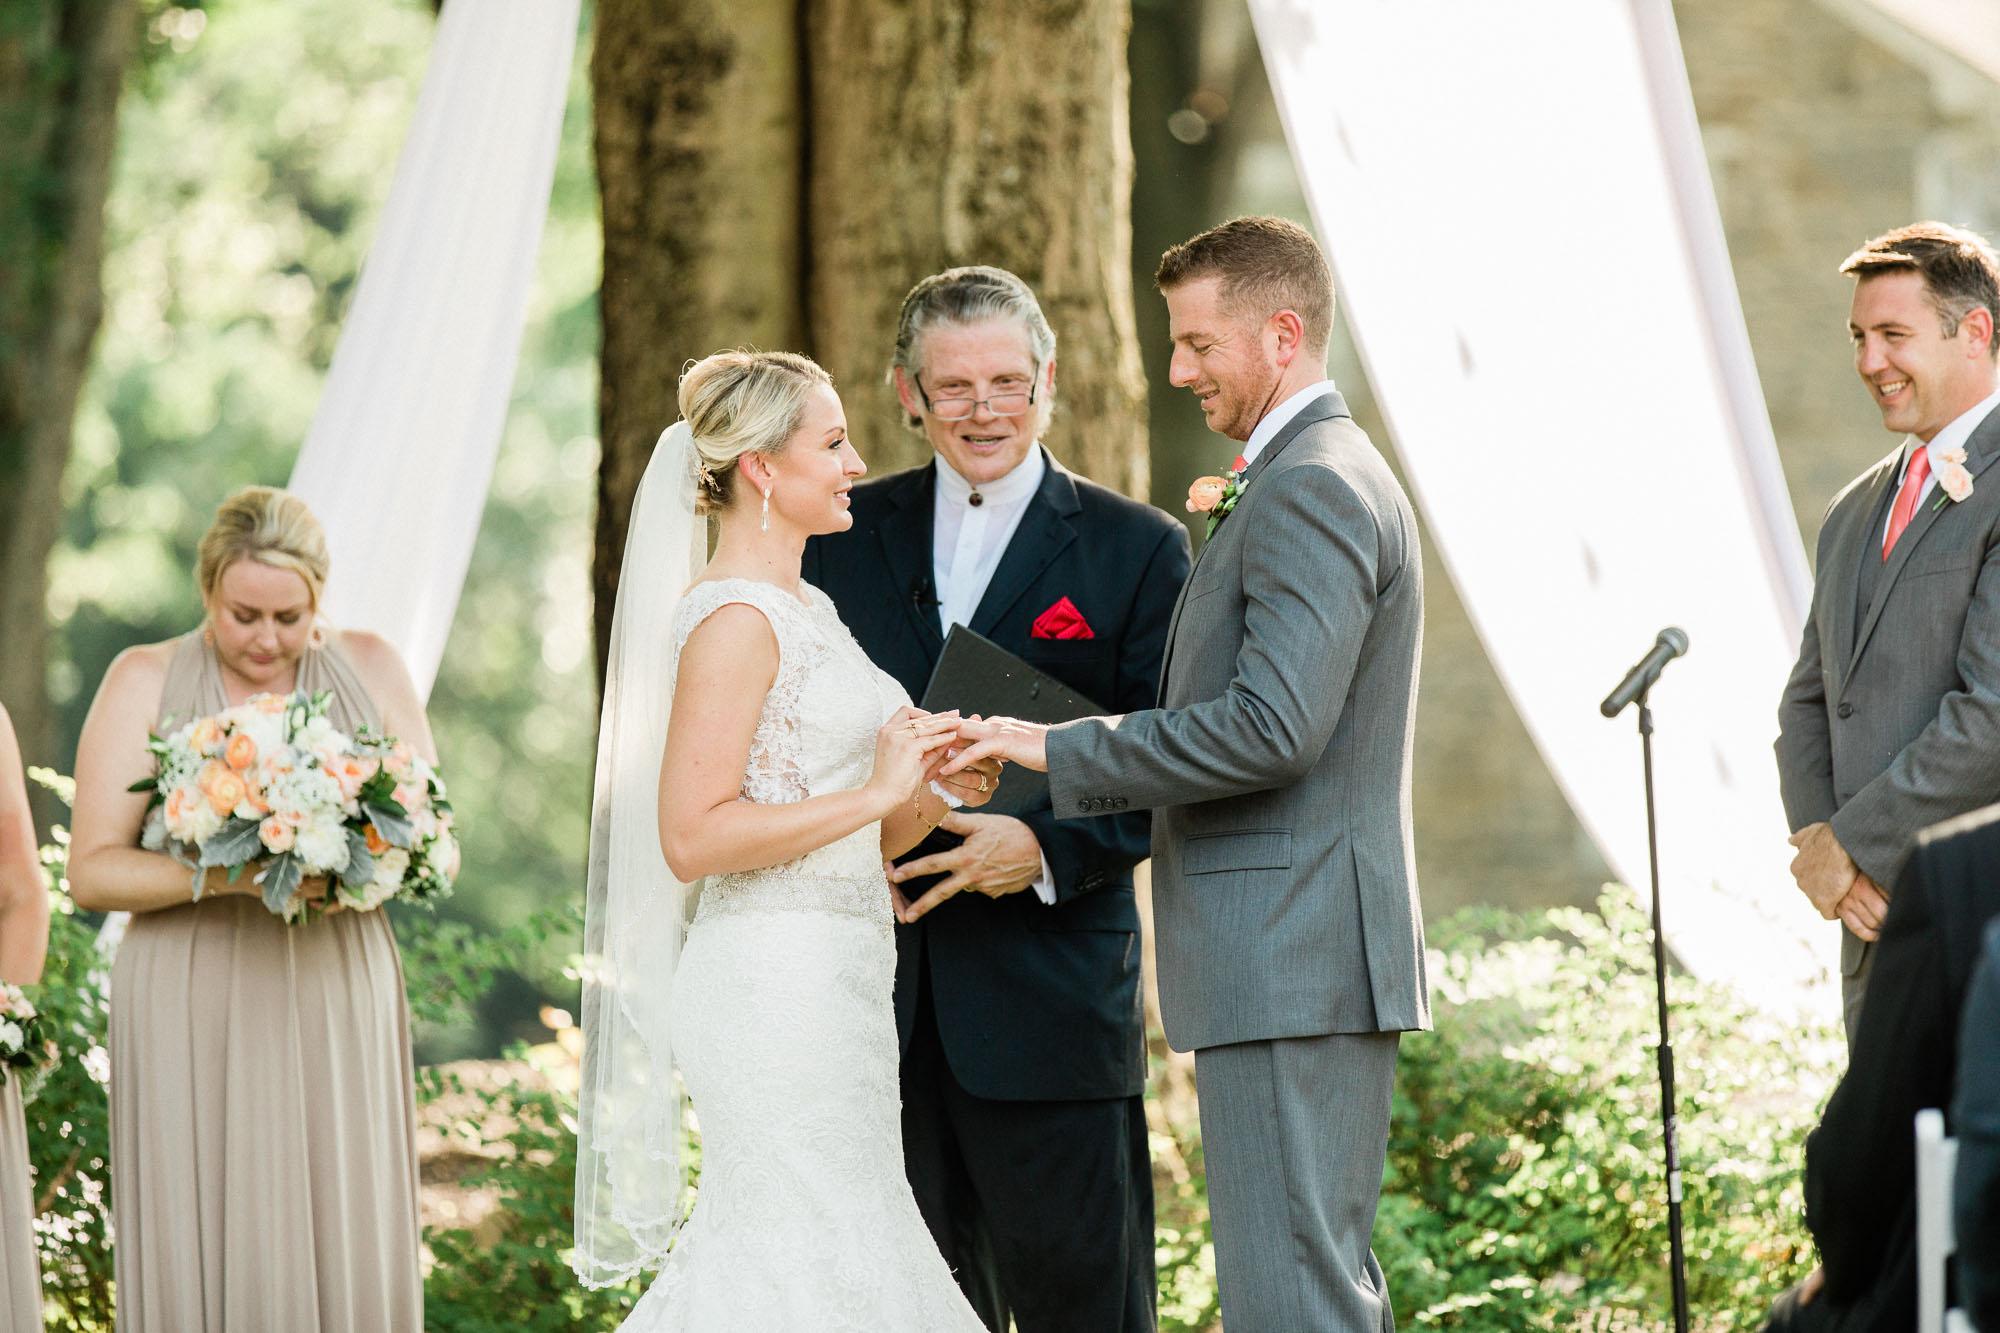 Allenberry-resort-historic-pennsylvania-wedding-22066.jpg